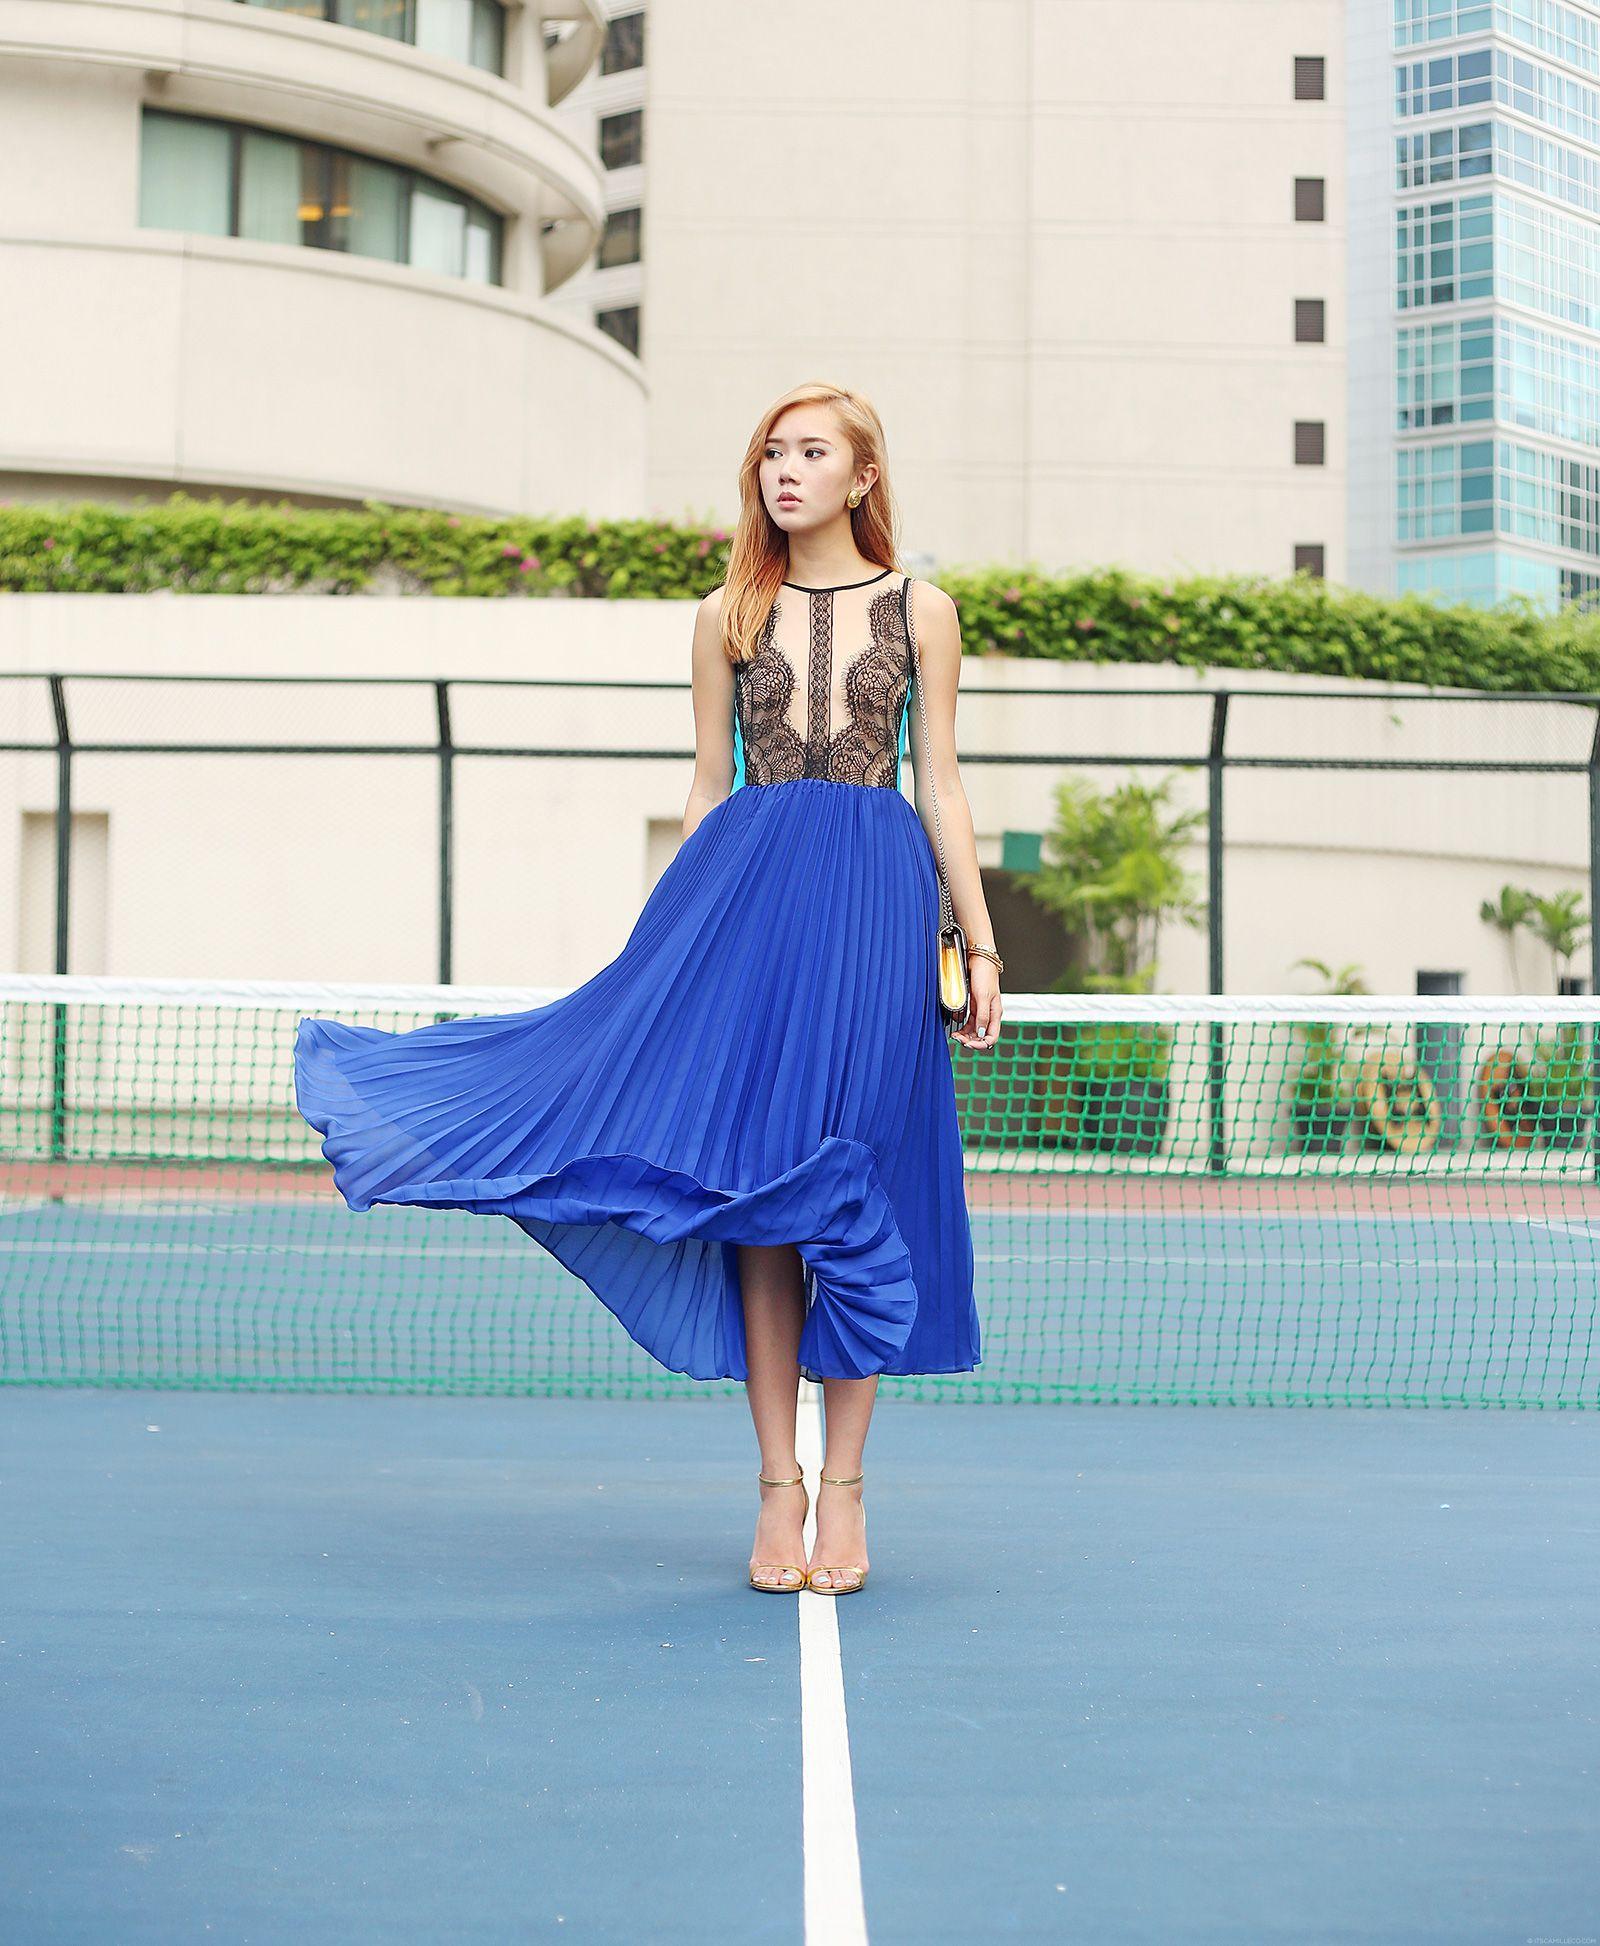 StyleMoi Lace Dress on itscamilleco.com